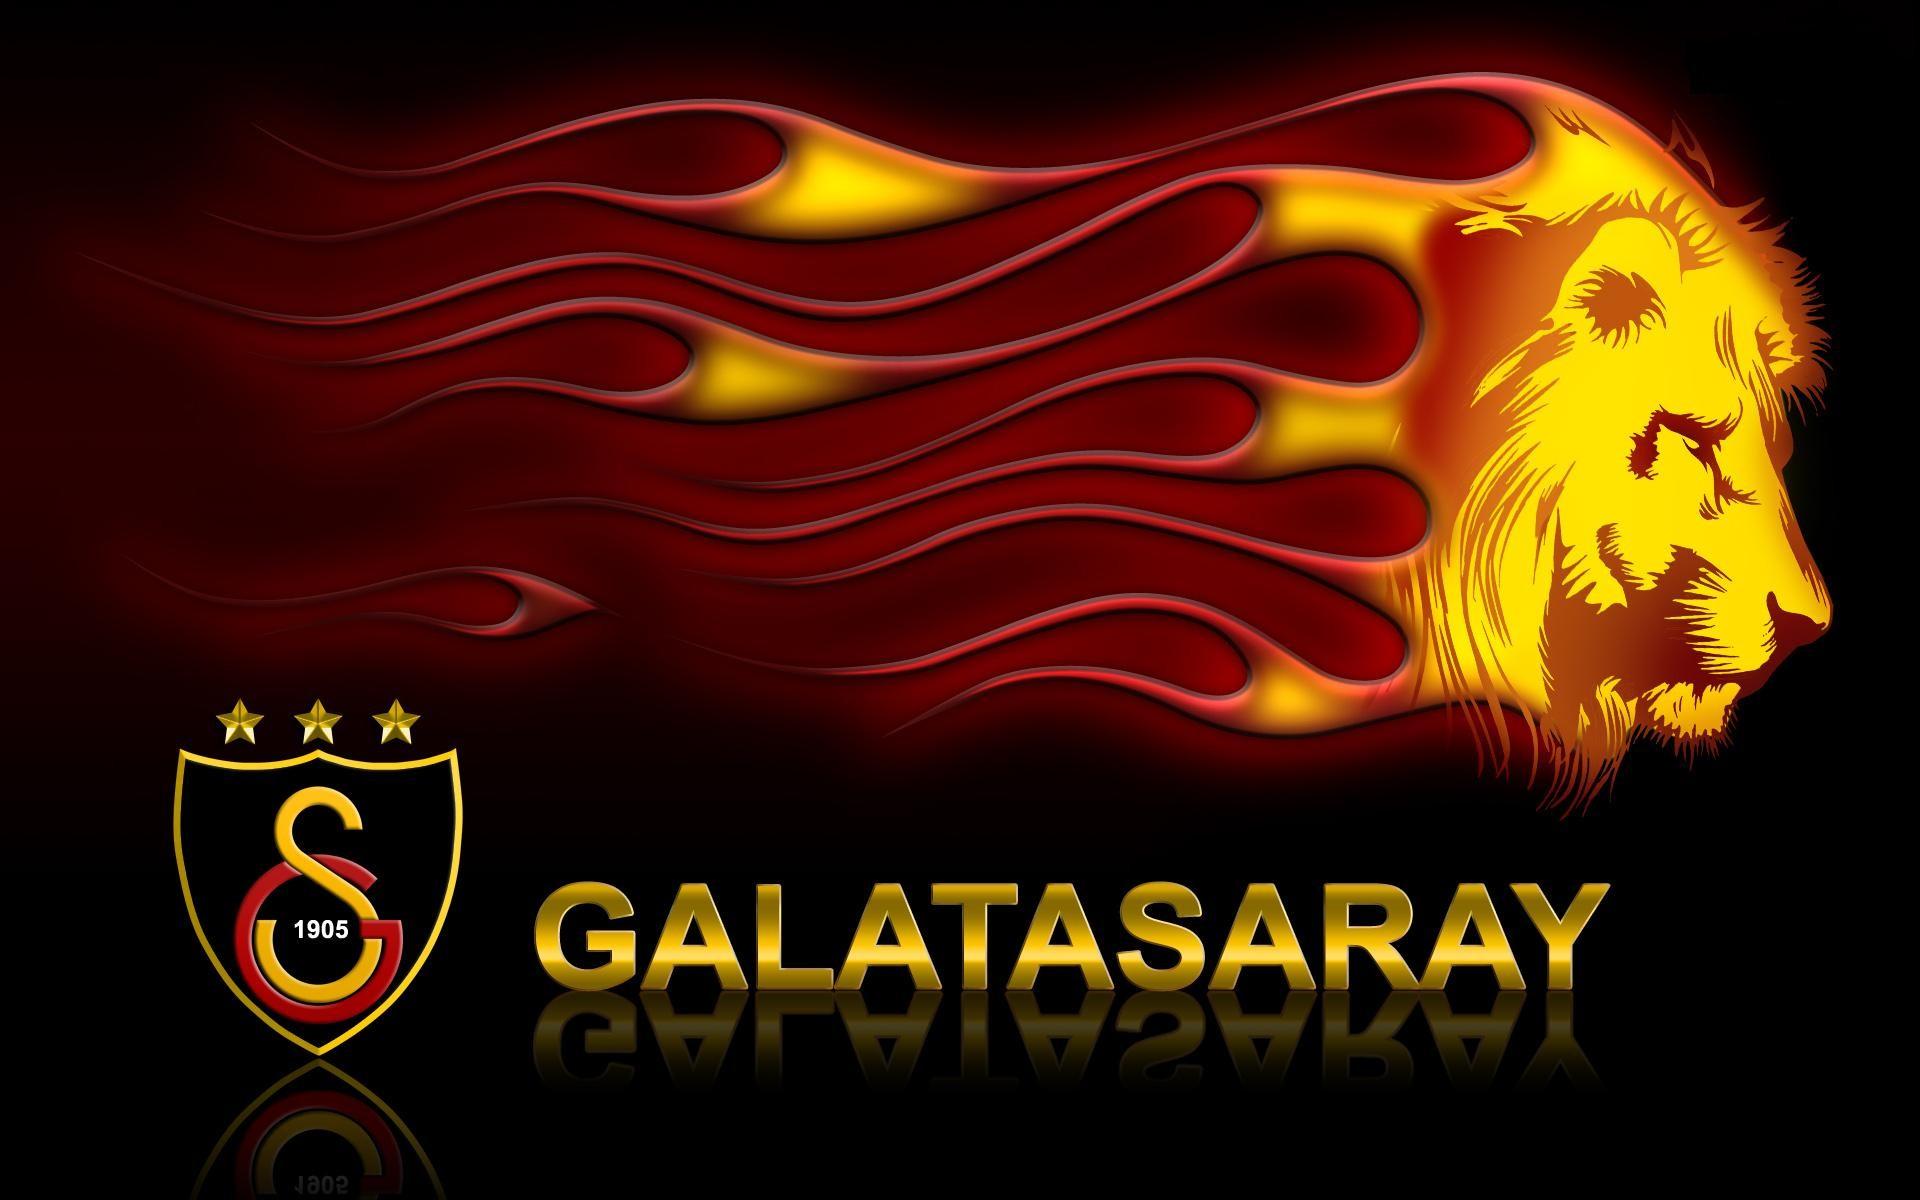 Galatasaray 543773 Uludağ Sözlük Galeri